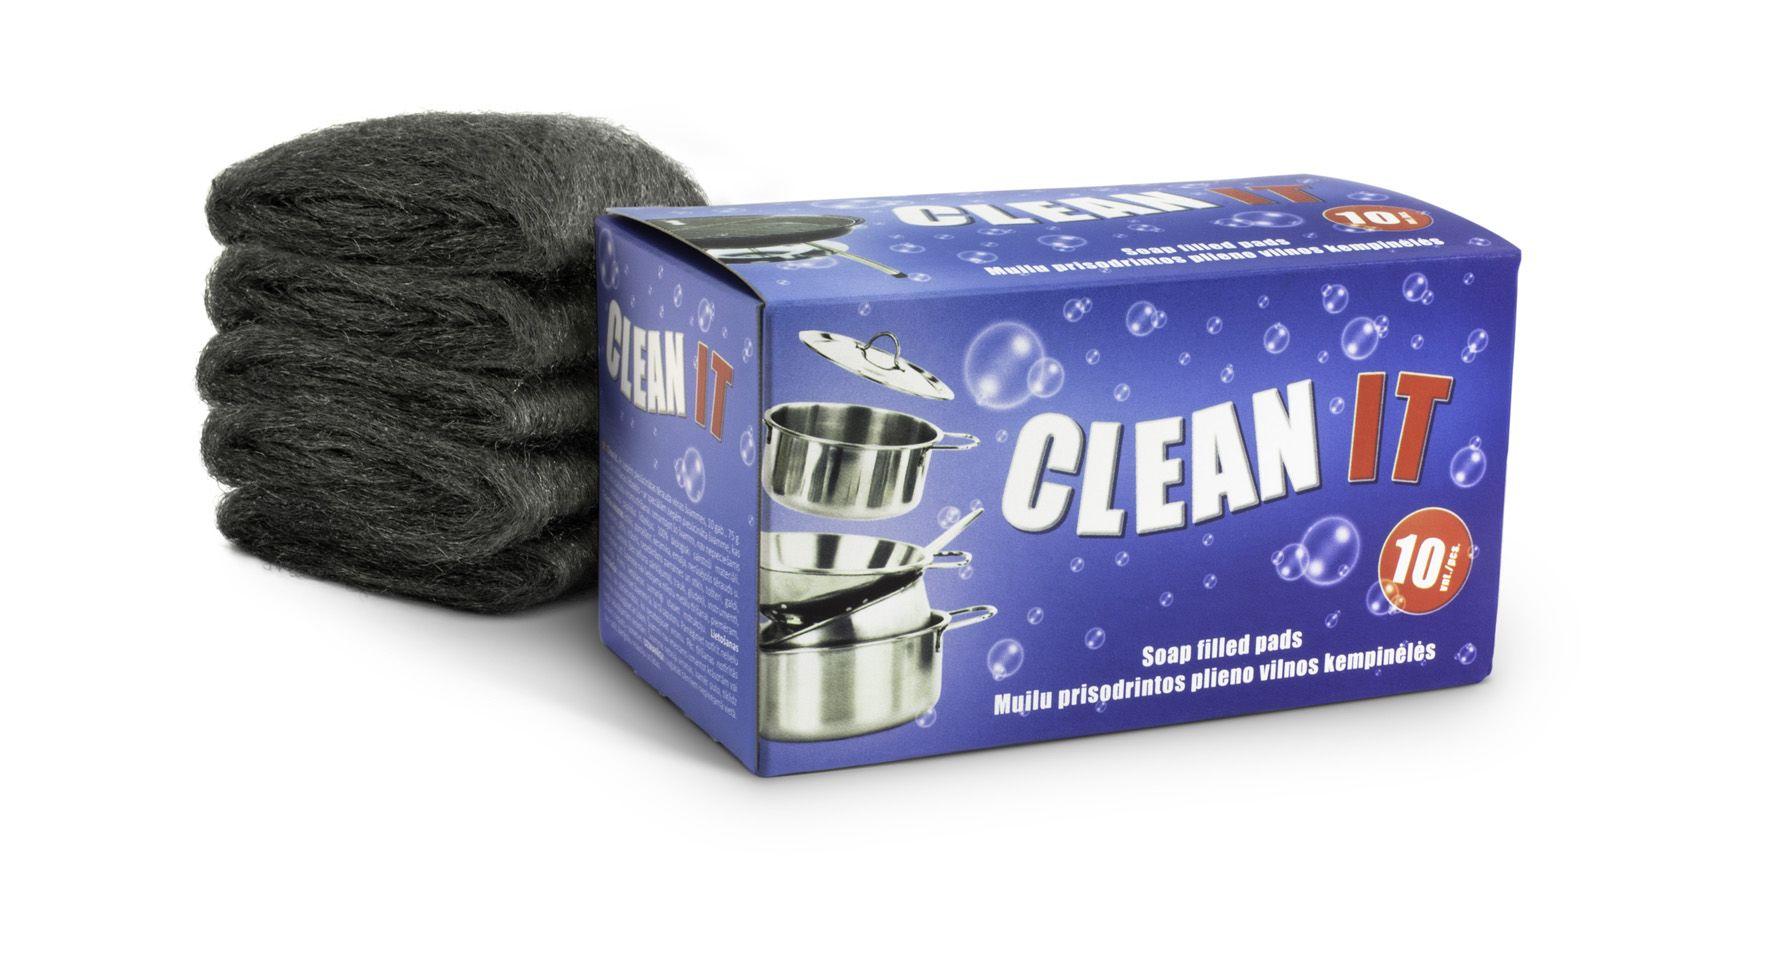 Muilu prisodrintos plieno vilnos kempinėlės CLEAN IT! , 10vnt.